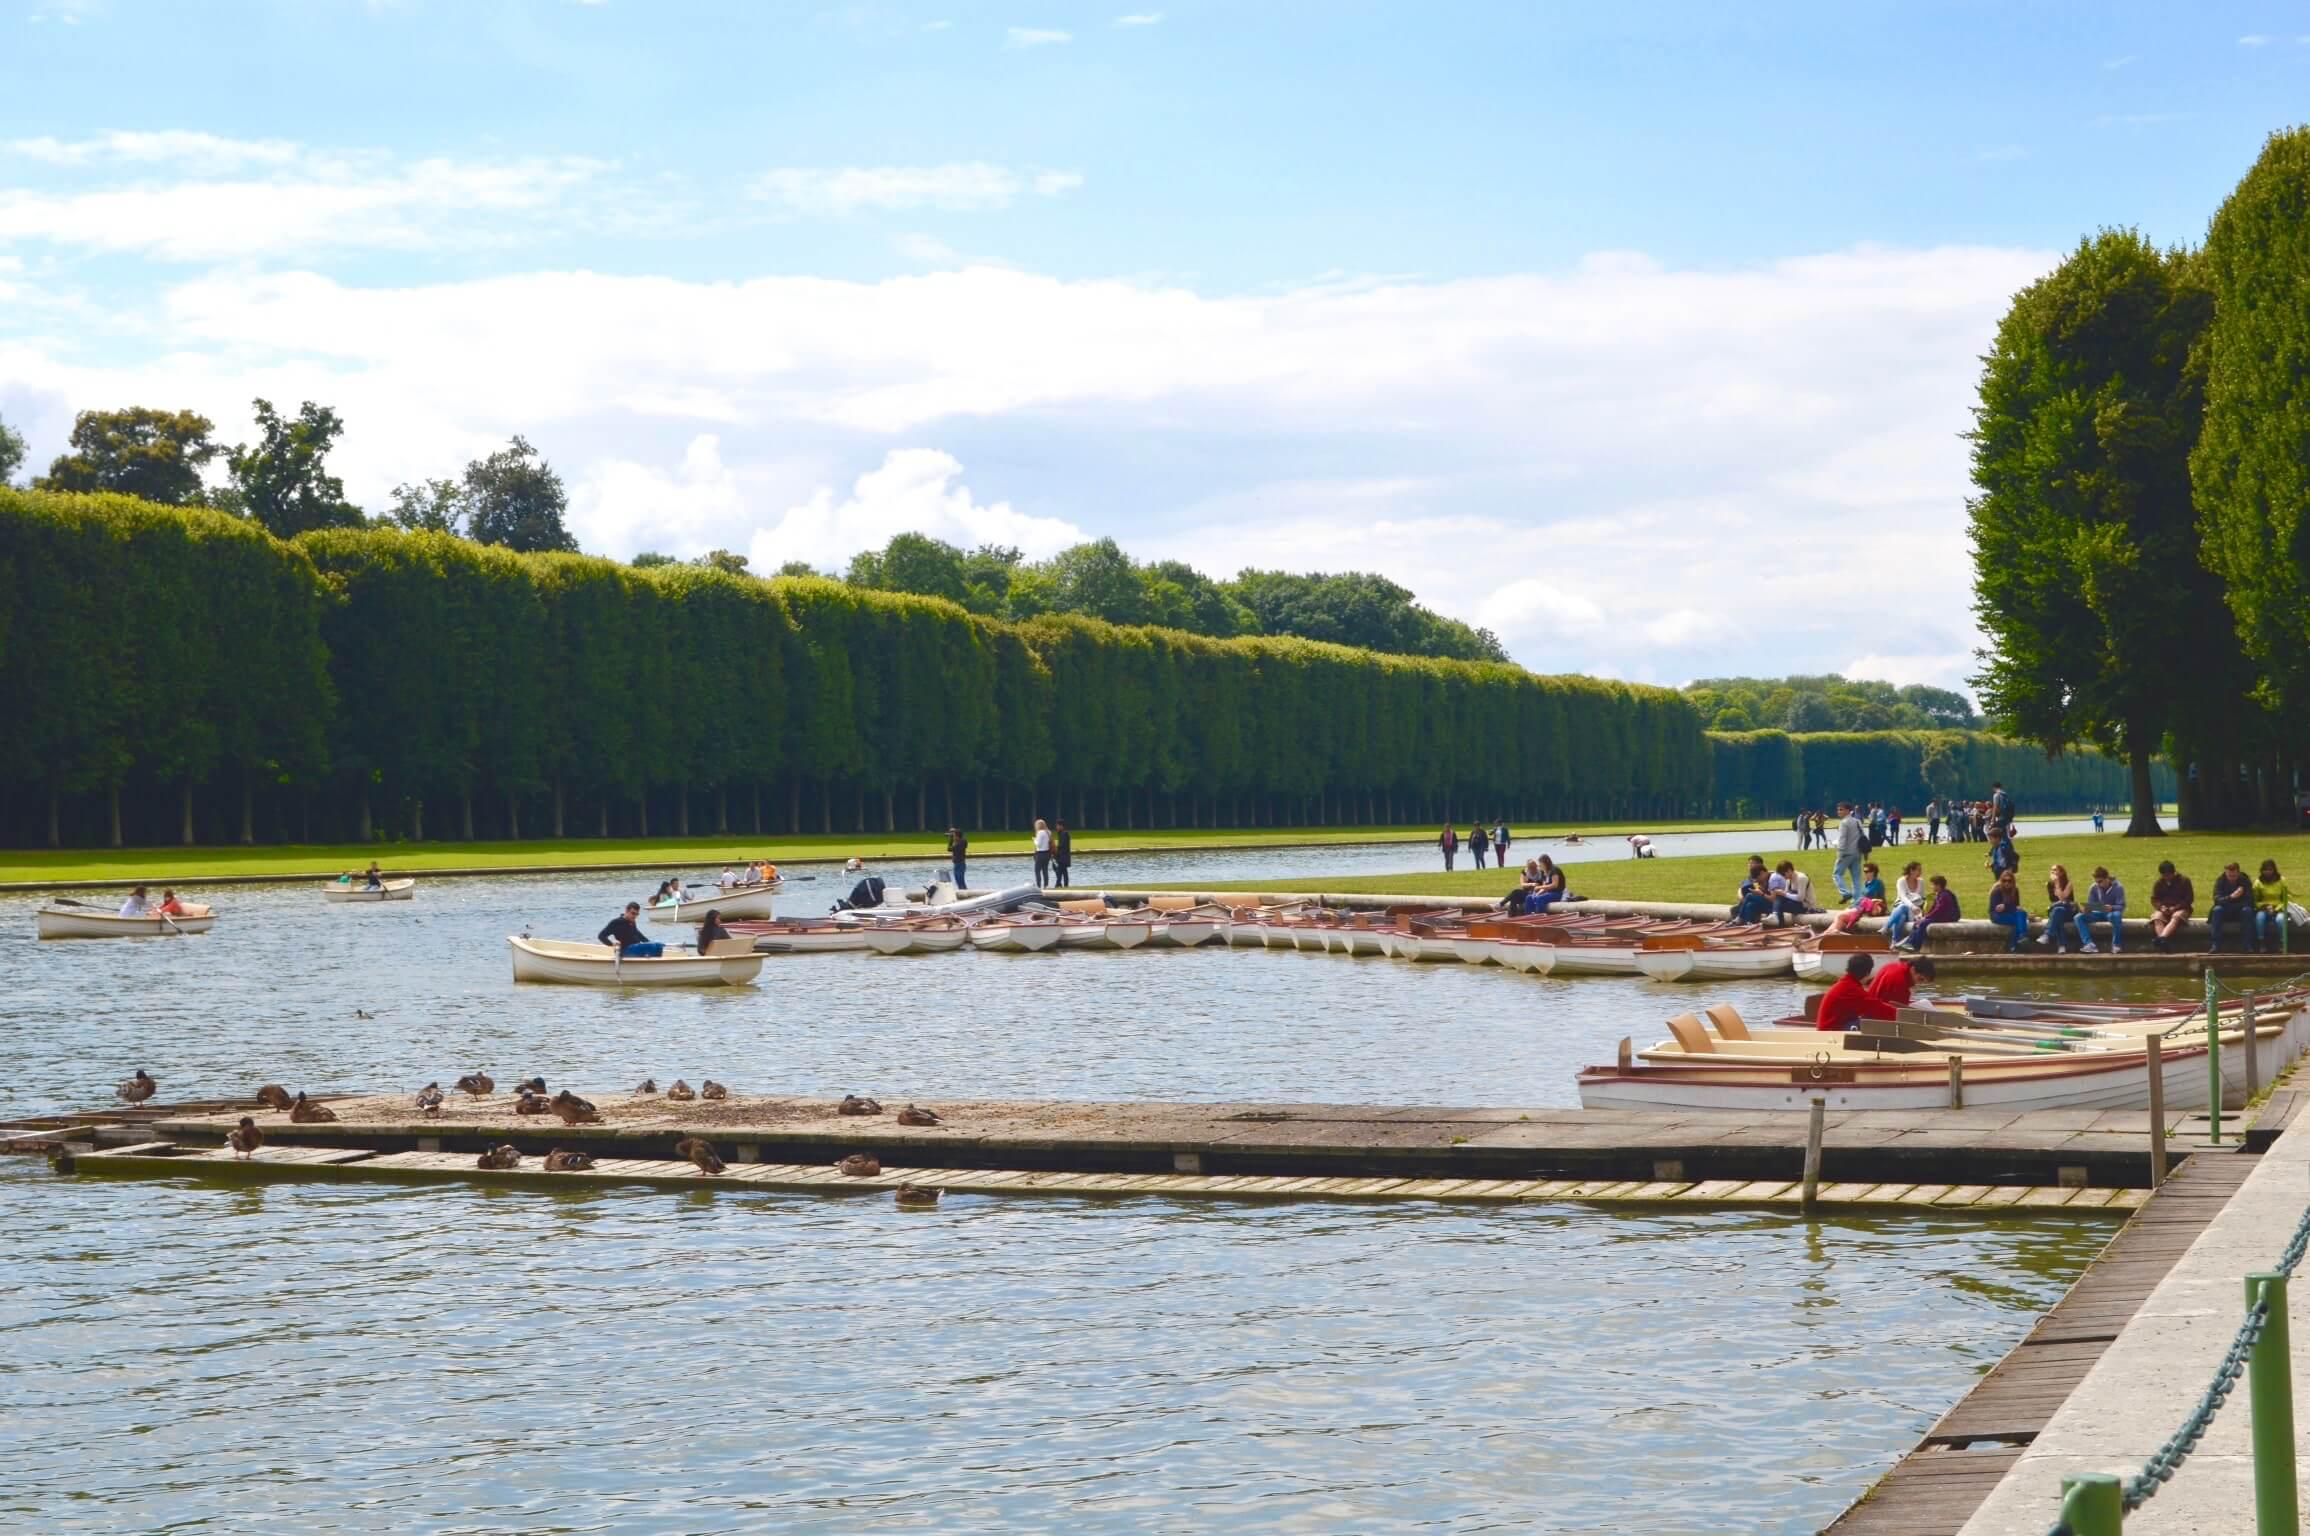 Lake at the Palace de Versailles in Paris